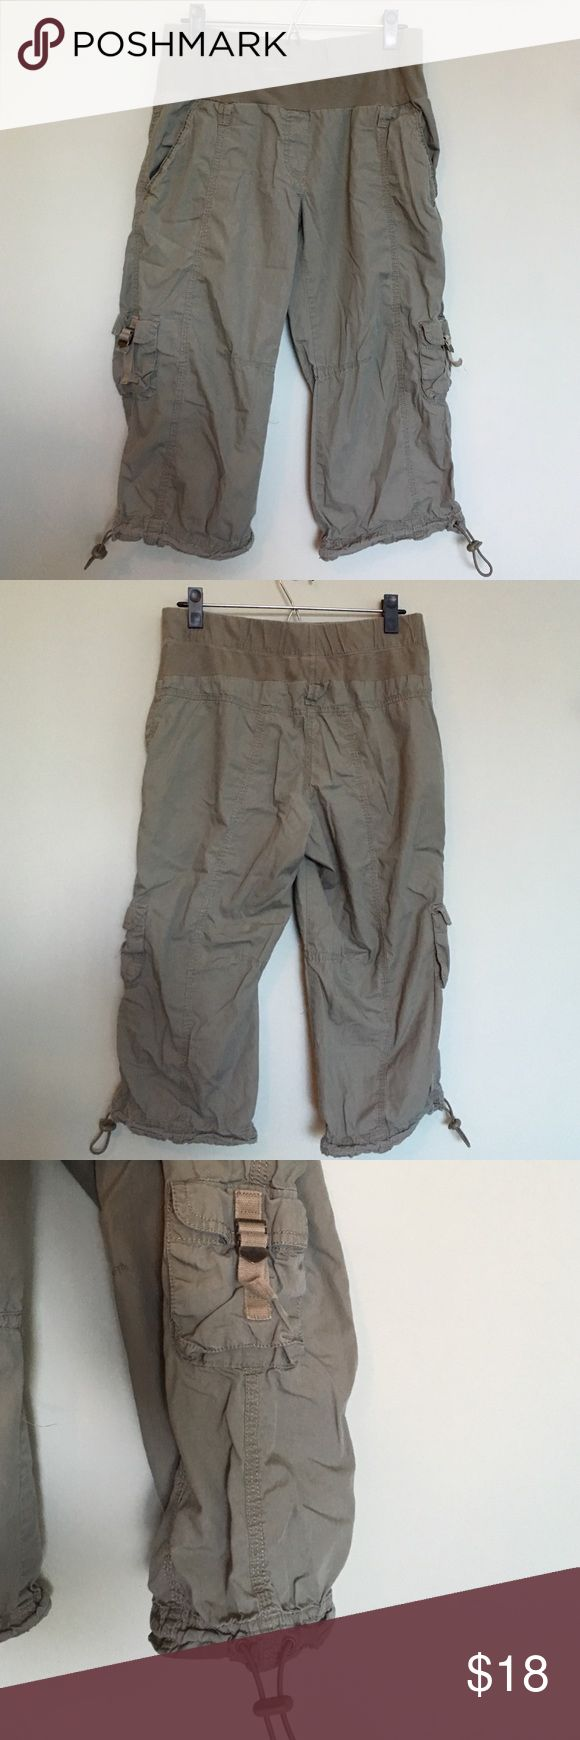 Maternity capris Green/kaki, light weight, great condition, pockets & drawstrings on legs Motherhood Maternity Pants Capris